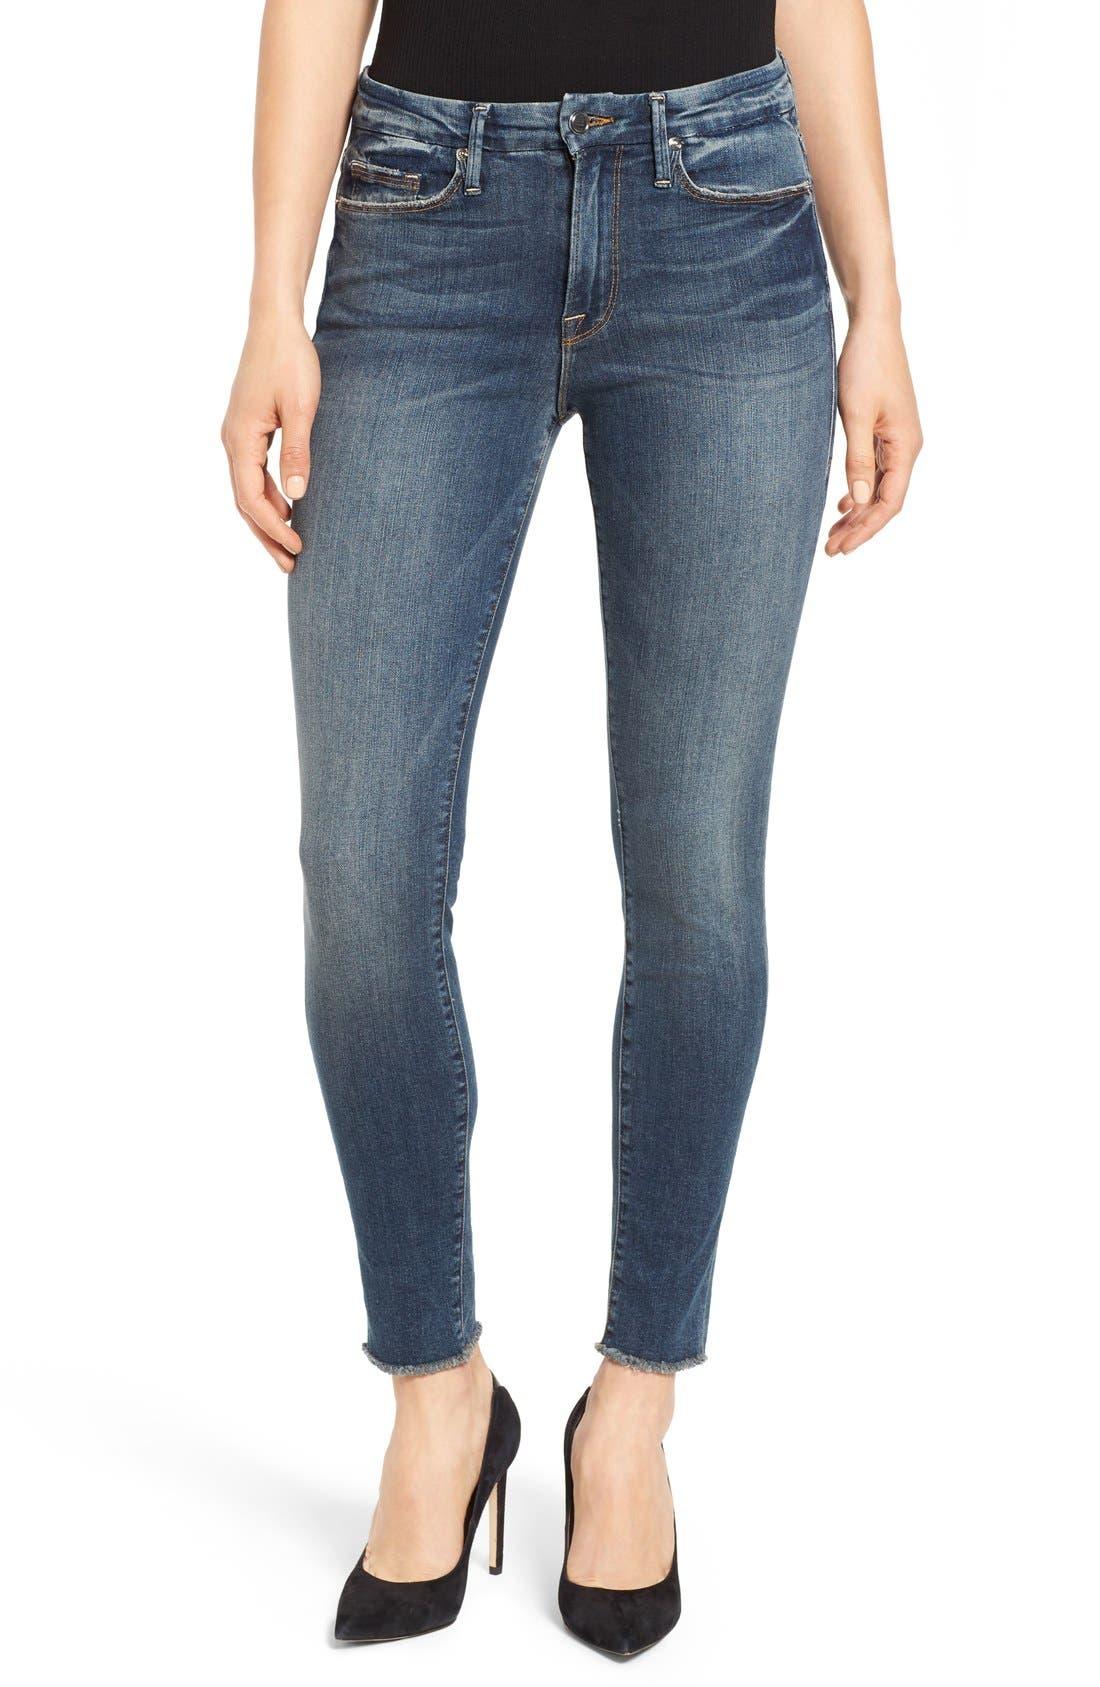 Sale alerts for  Good Legs Skinny Jeans - Covvet